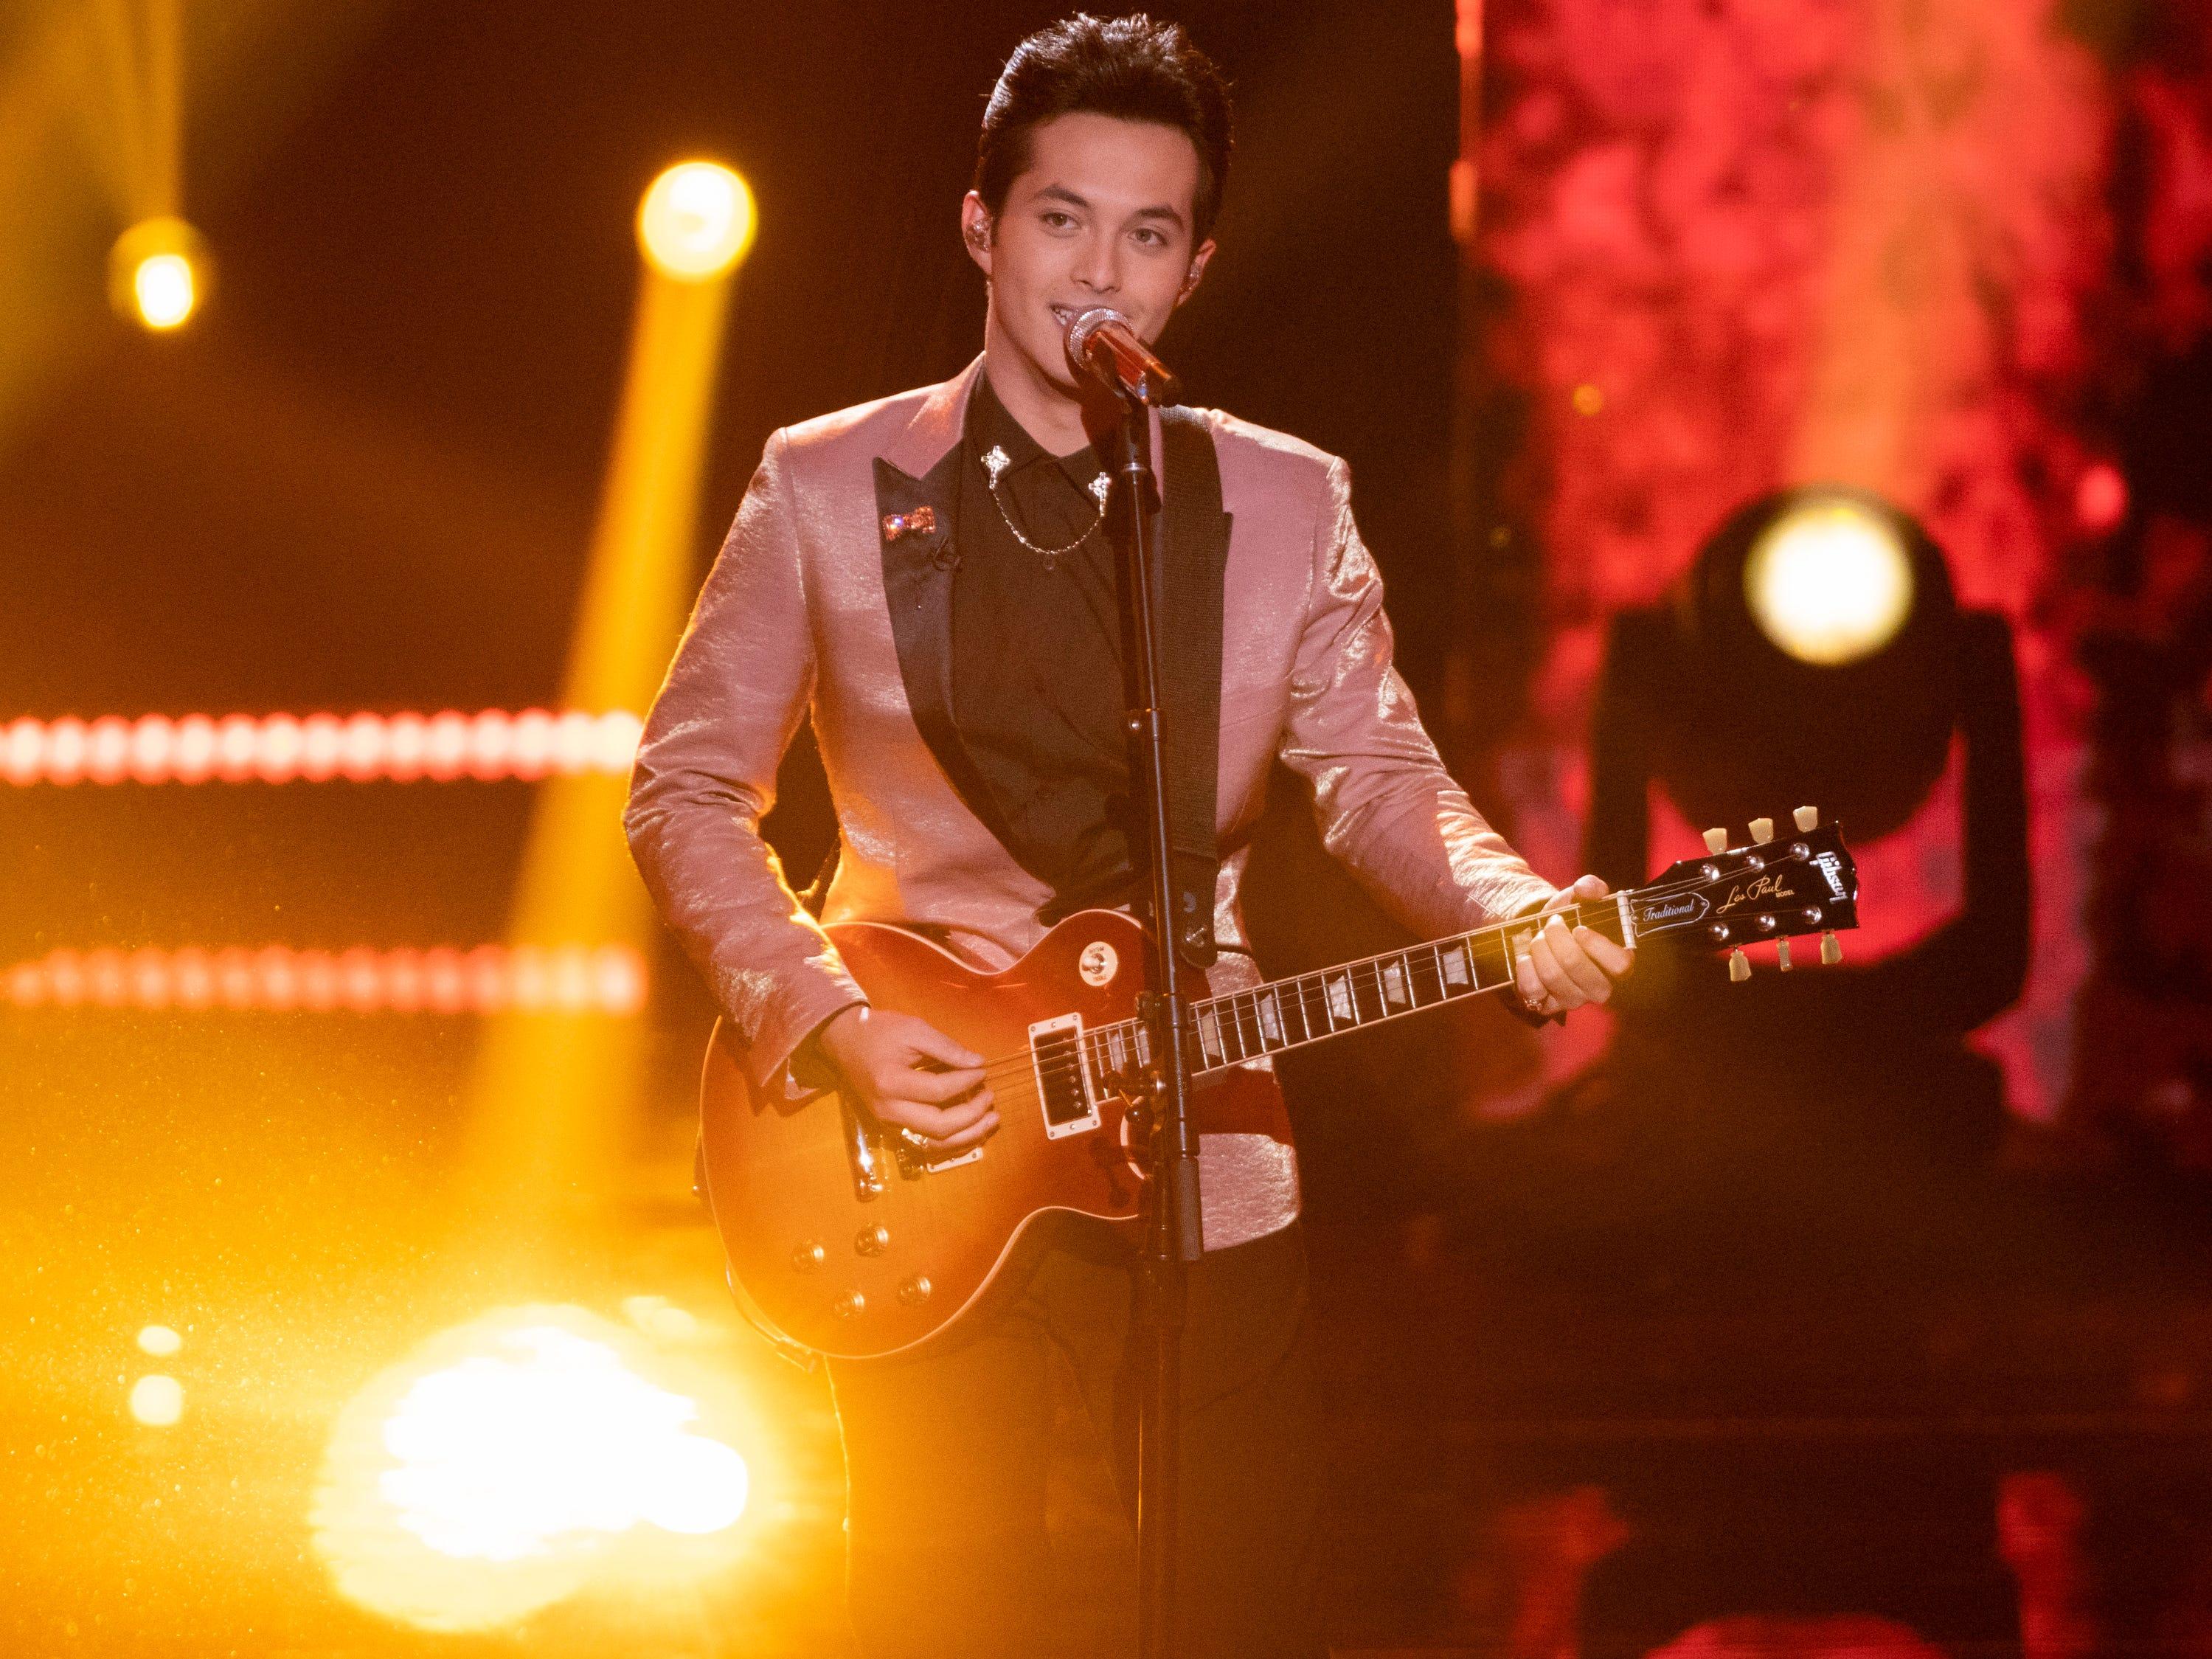 'American Idol': Southern heartthrob Laine Hardy pulls off stunning win over Alejandro Aranda